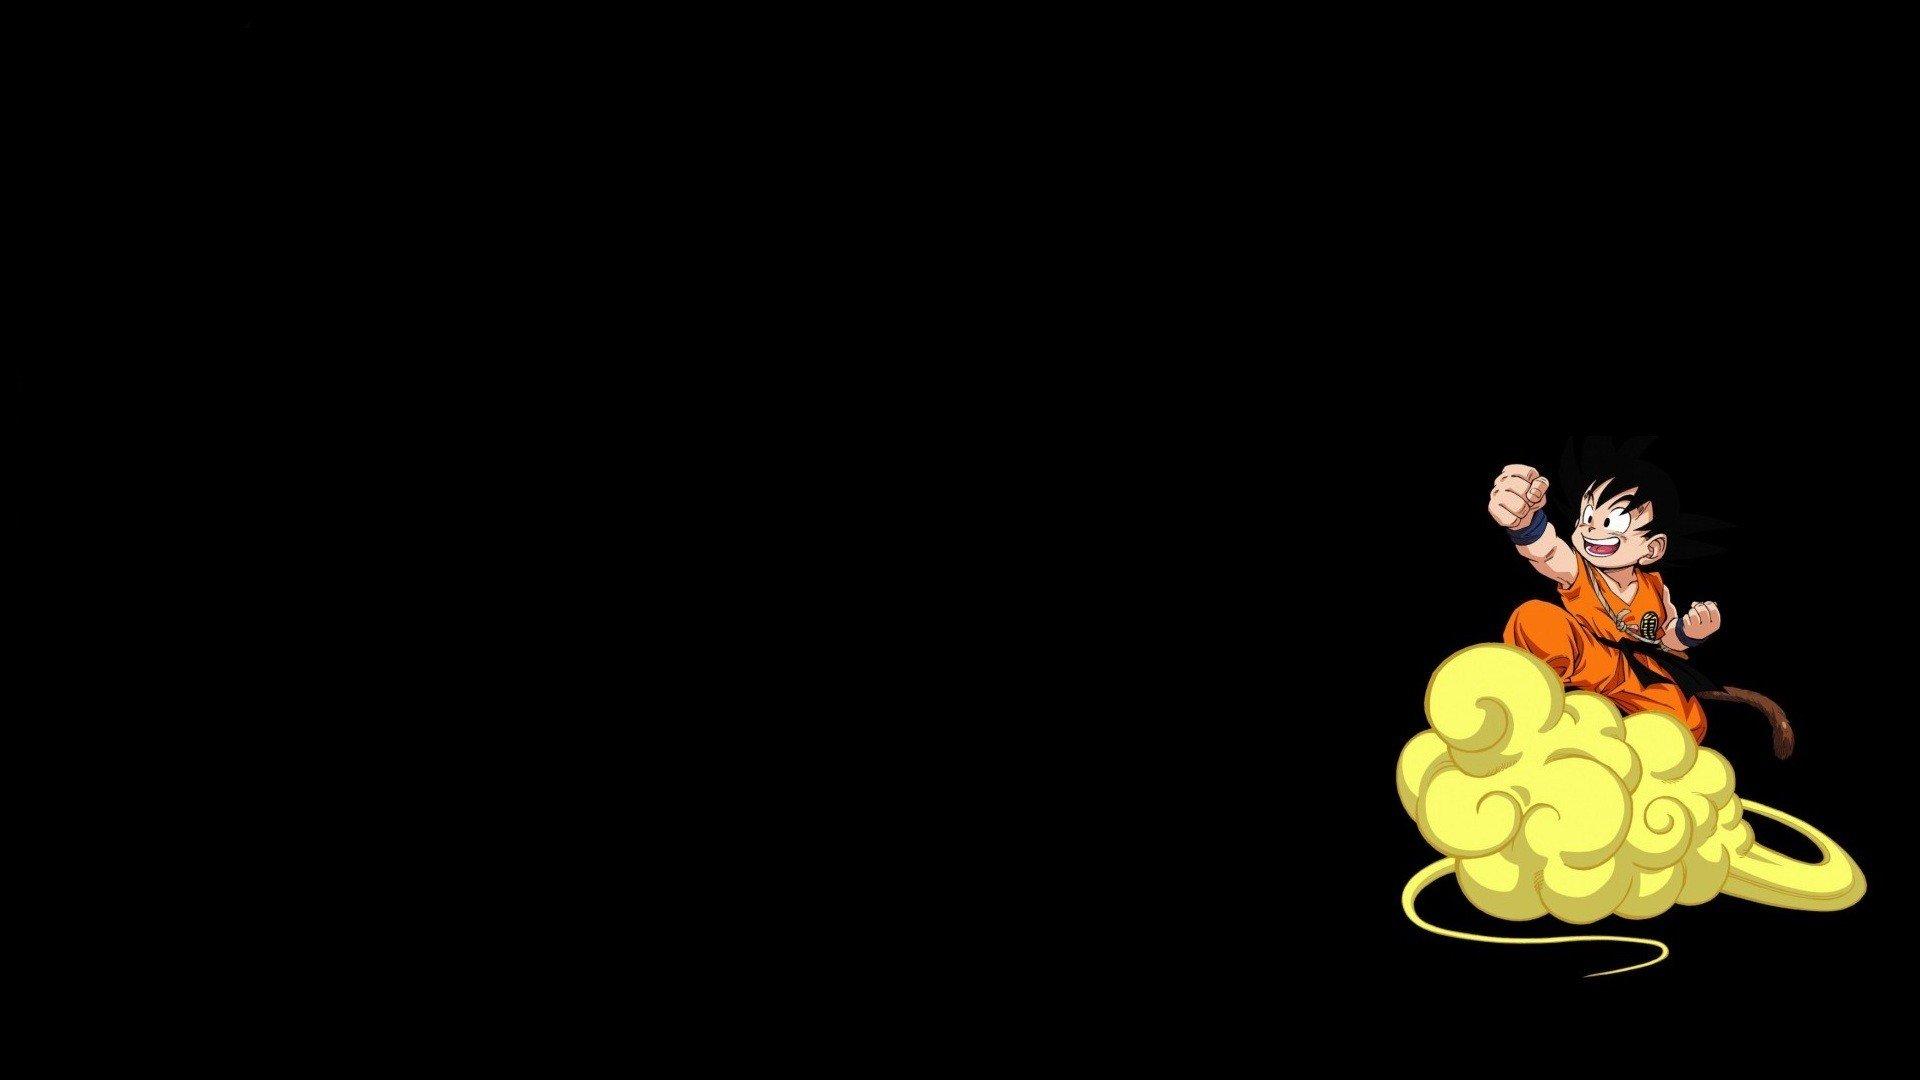 Zoom Hd Pics Dragonball Z Super Saiyan Goku Wallpapers Hd 1920x1080